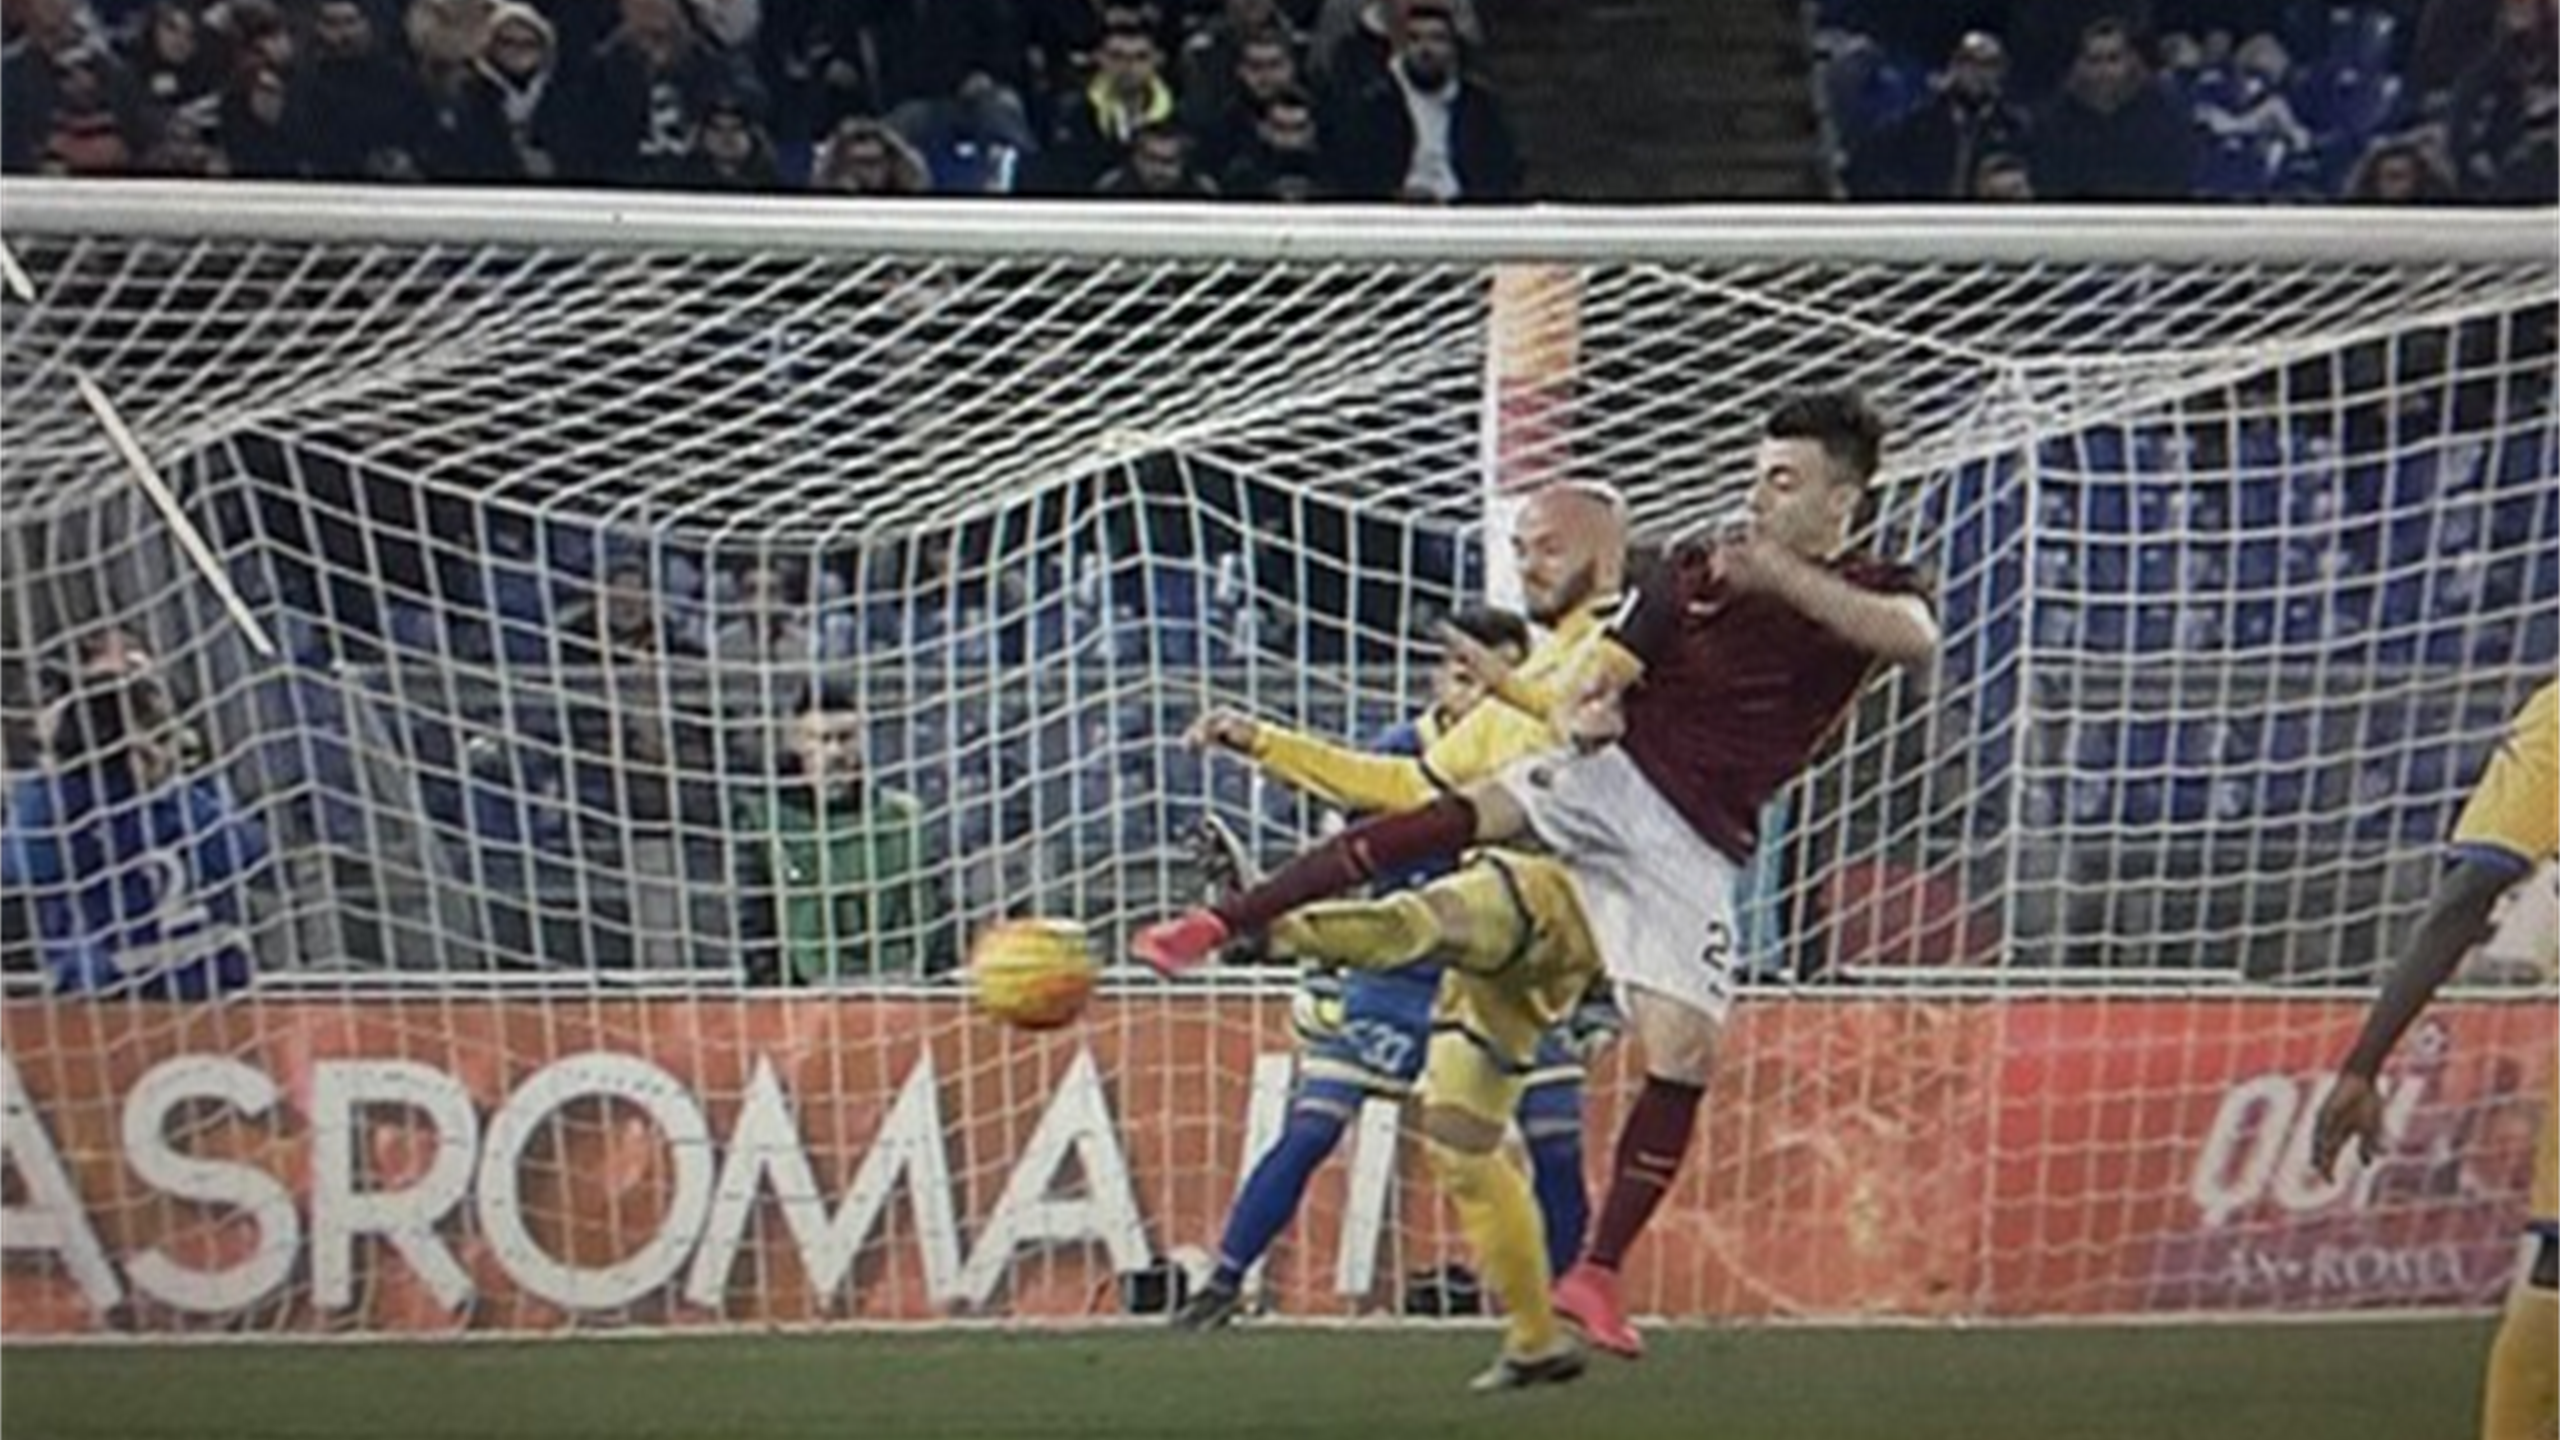 Il gol di tacco di El Shaarawy in Roma-Frosinone